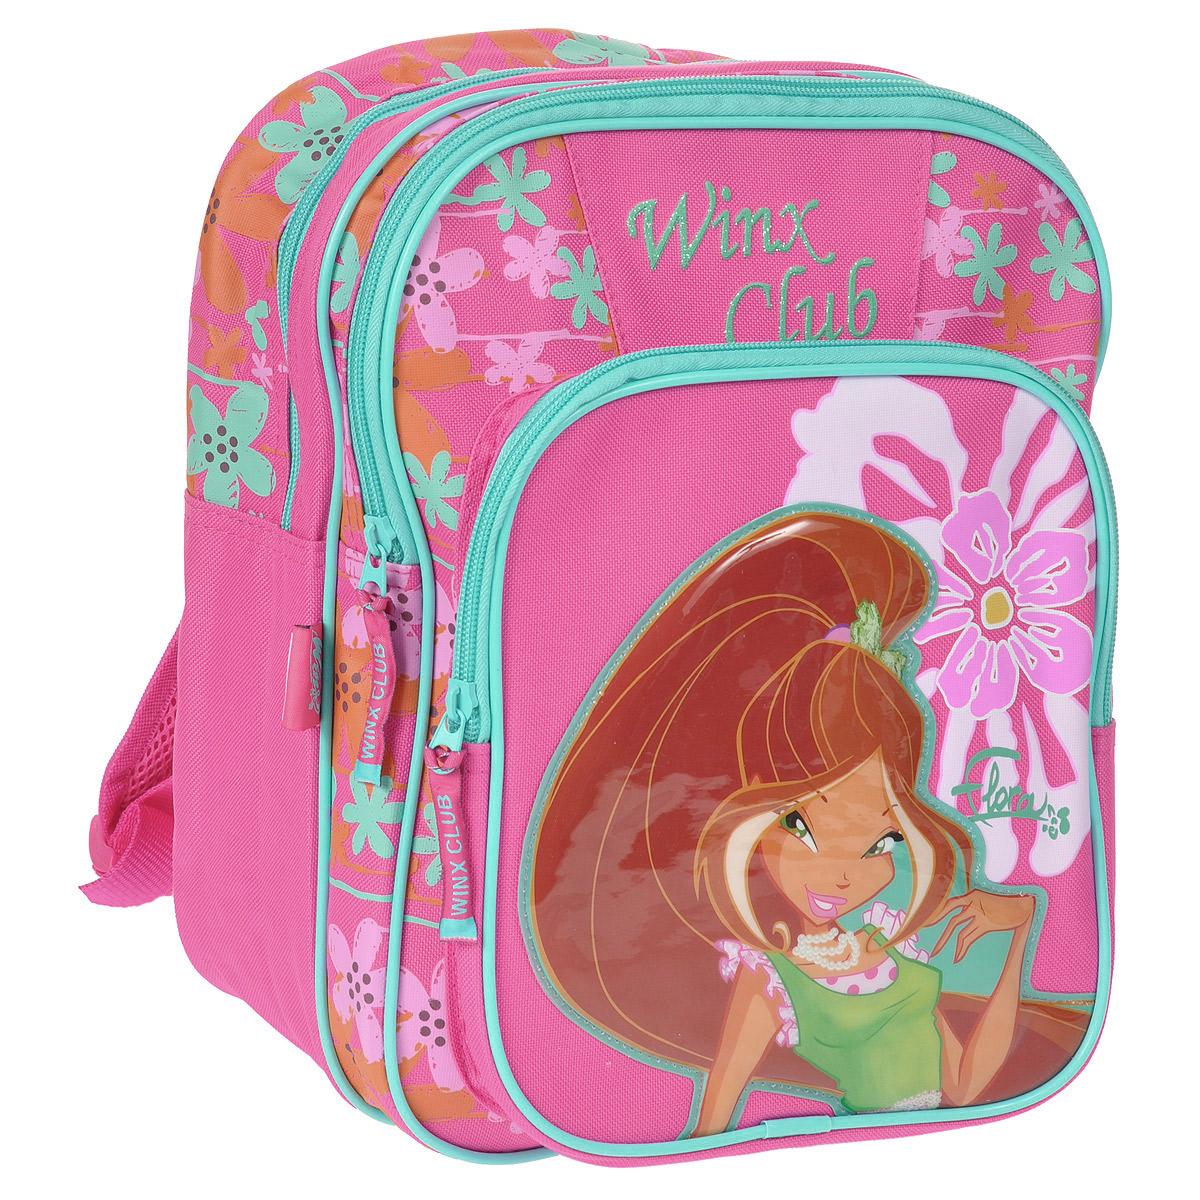 "Рюкзак школьный Winx Club ""Fairy diary"", №1, цвет: розовый. 20736"